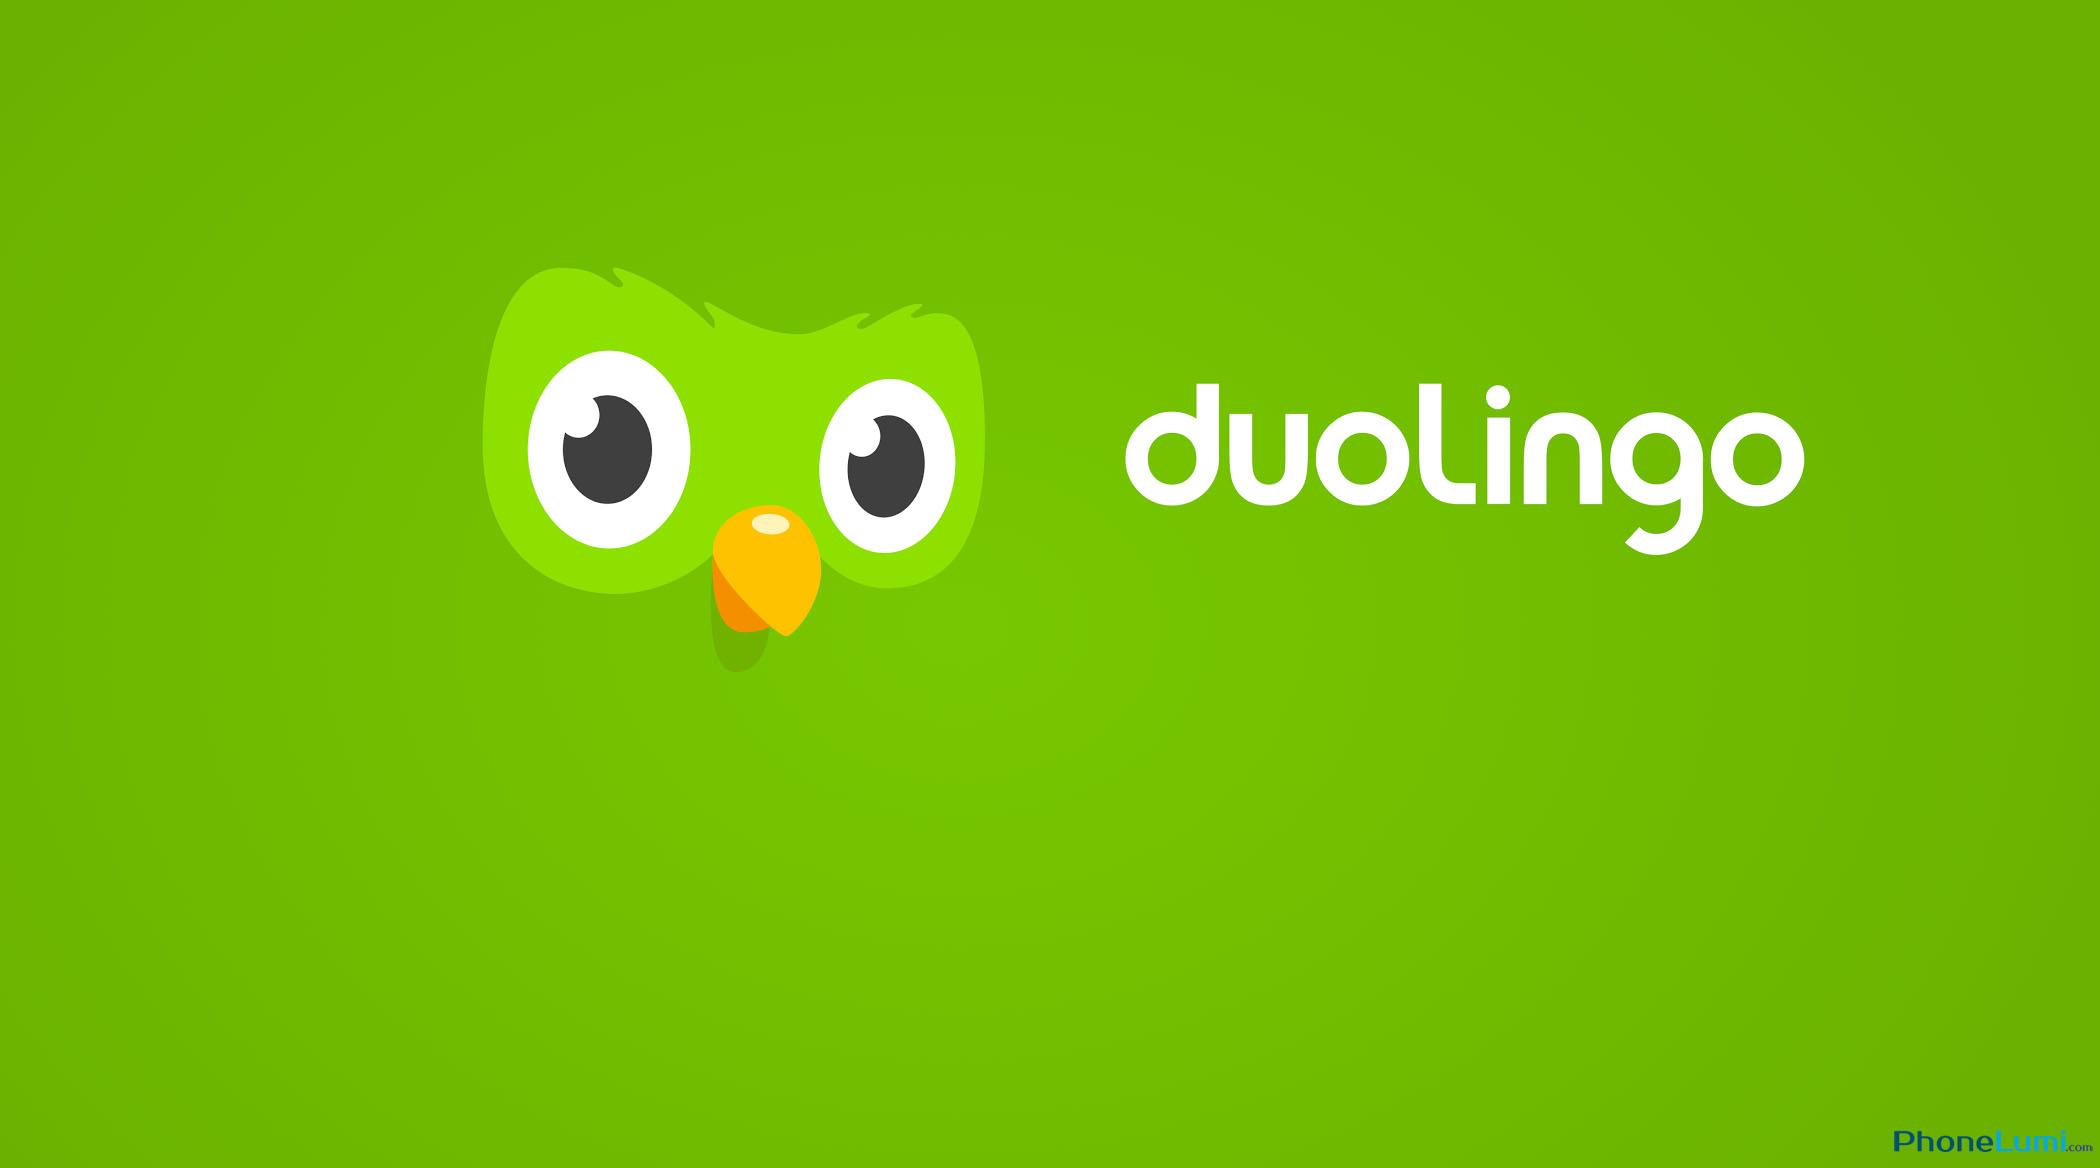 Duolingo ứng dụng học tiếng Anh cho smartphone